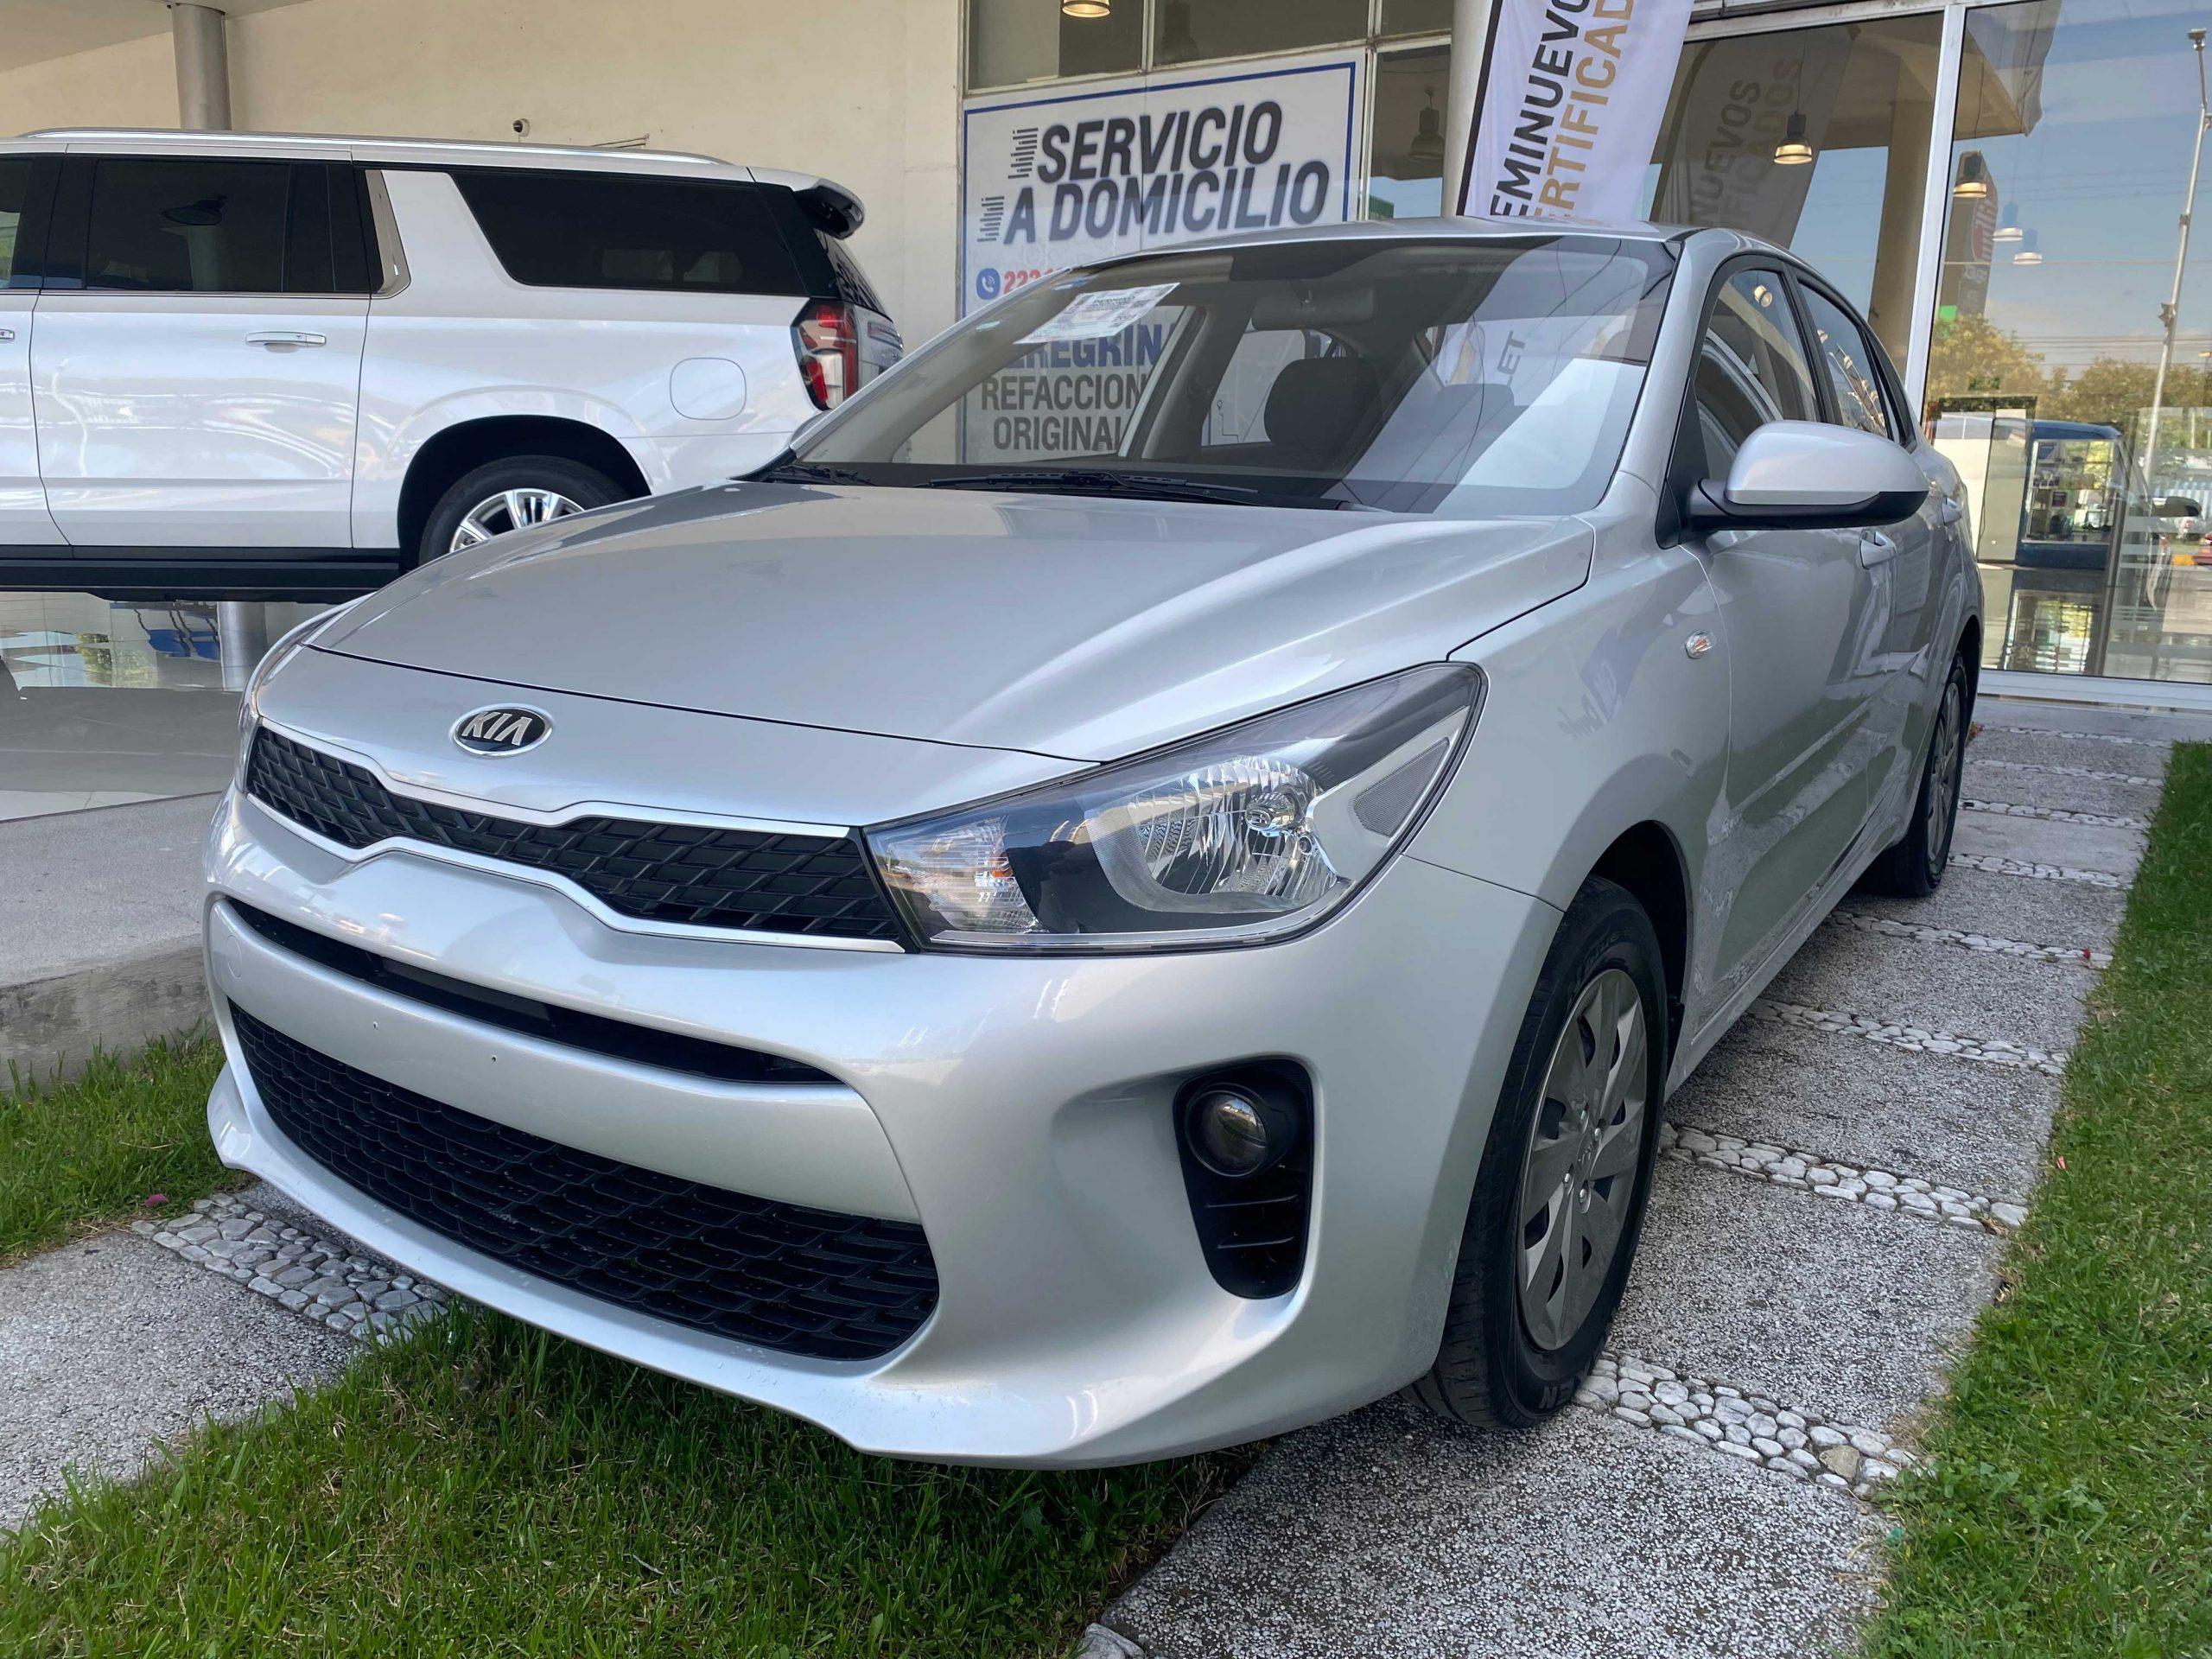 Kia Rio L Sedan Color Plata 2020 At